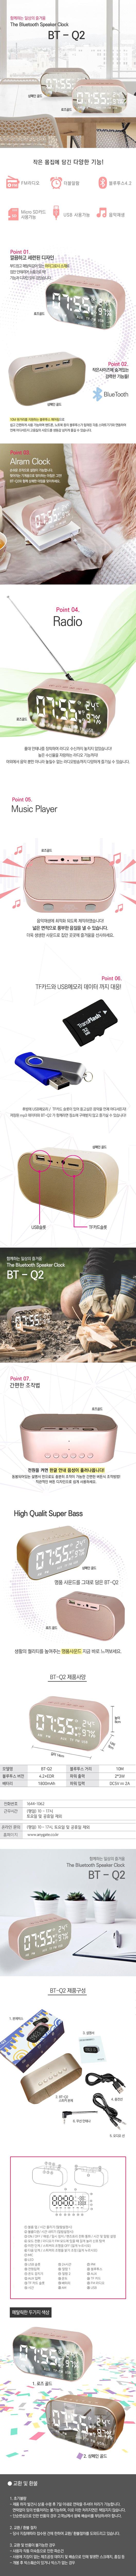 BT-Q2-BLACK.jpg